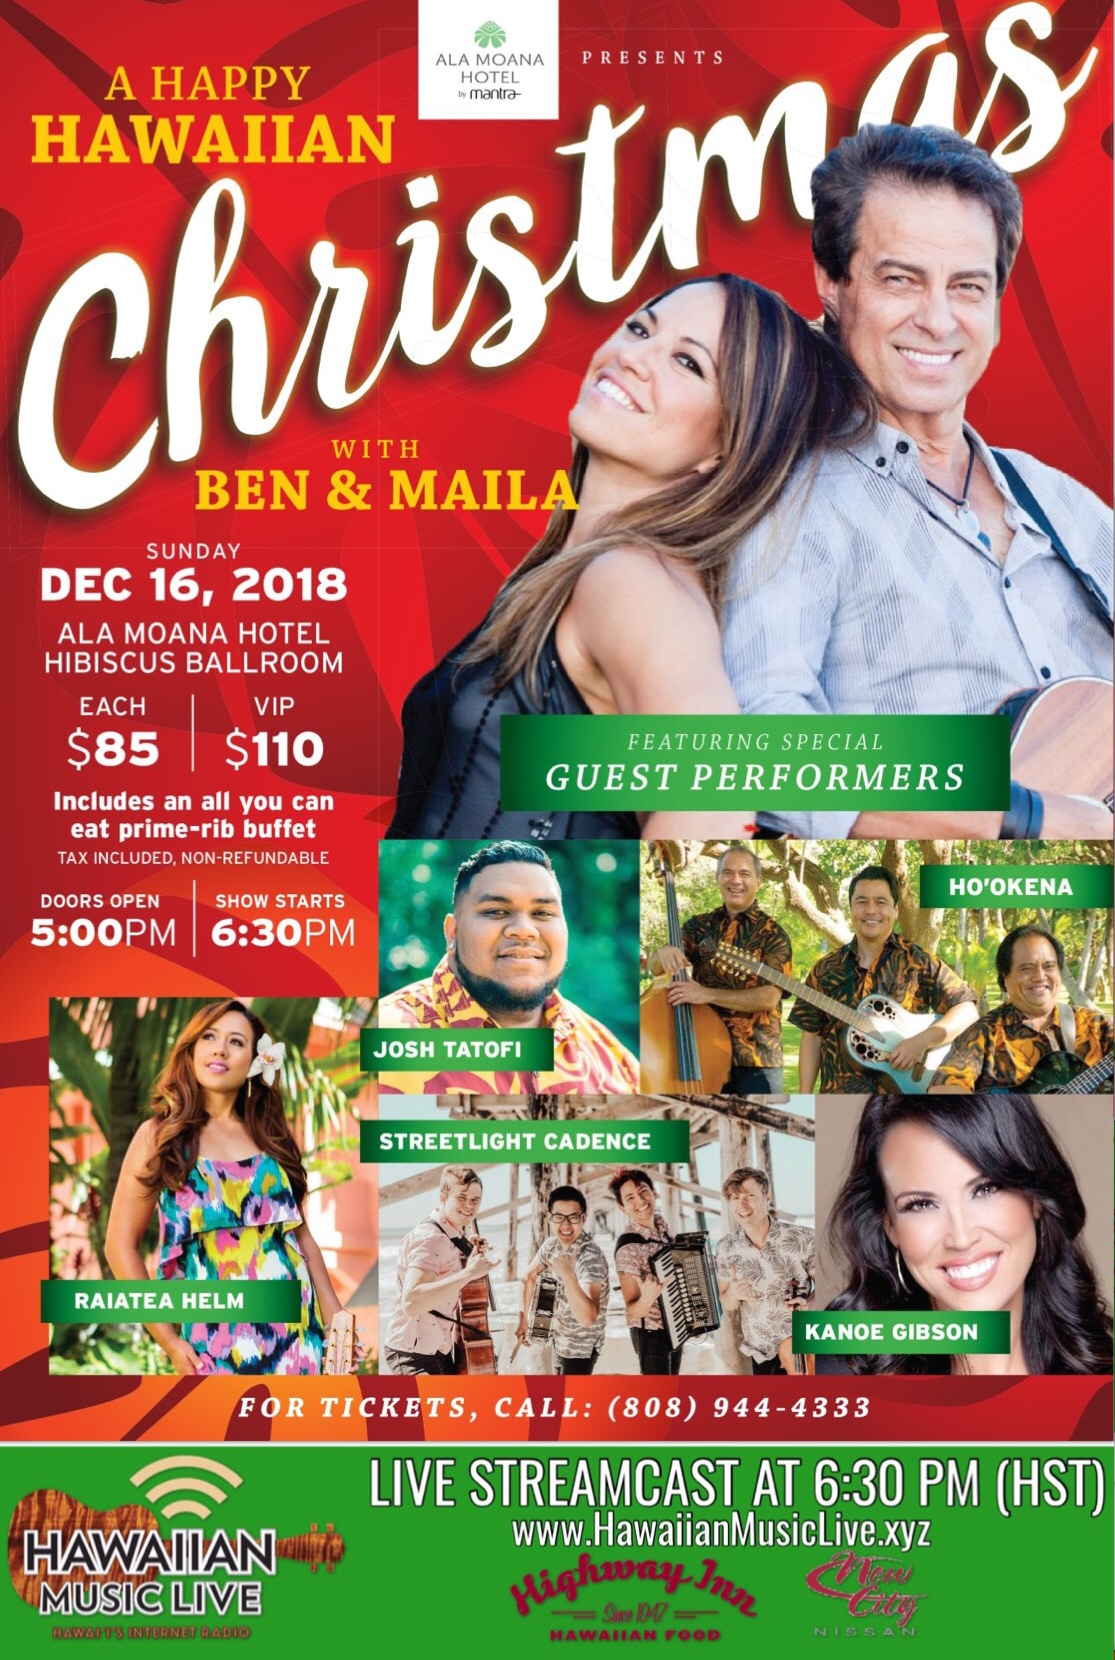 Christmas In Hawaii Movie.5th Annual A Happy Hawaiian Christmas With Ben Maila